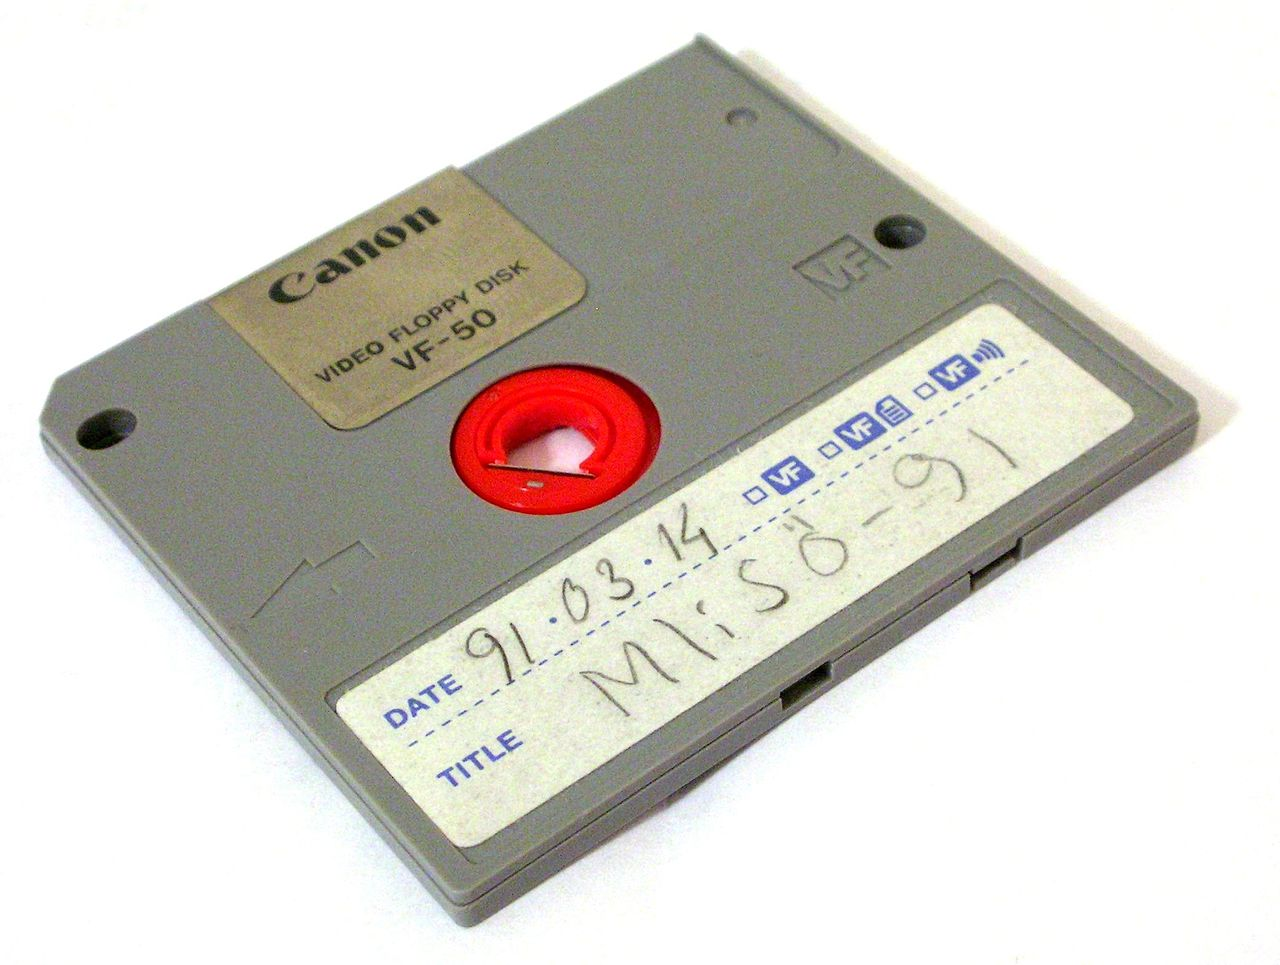 Video Floppy Disk